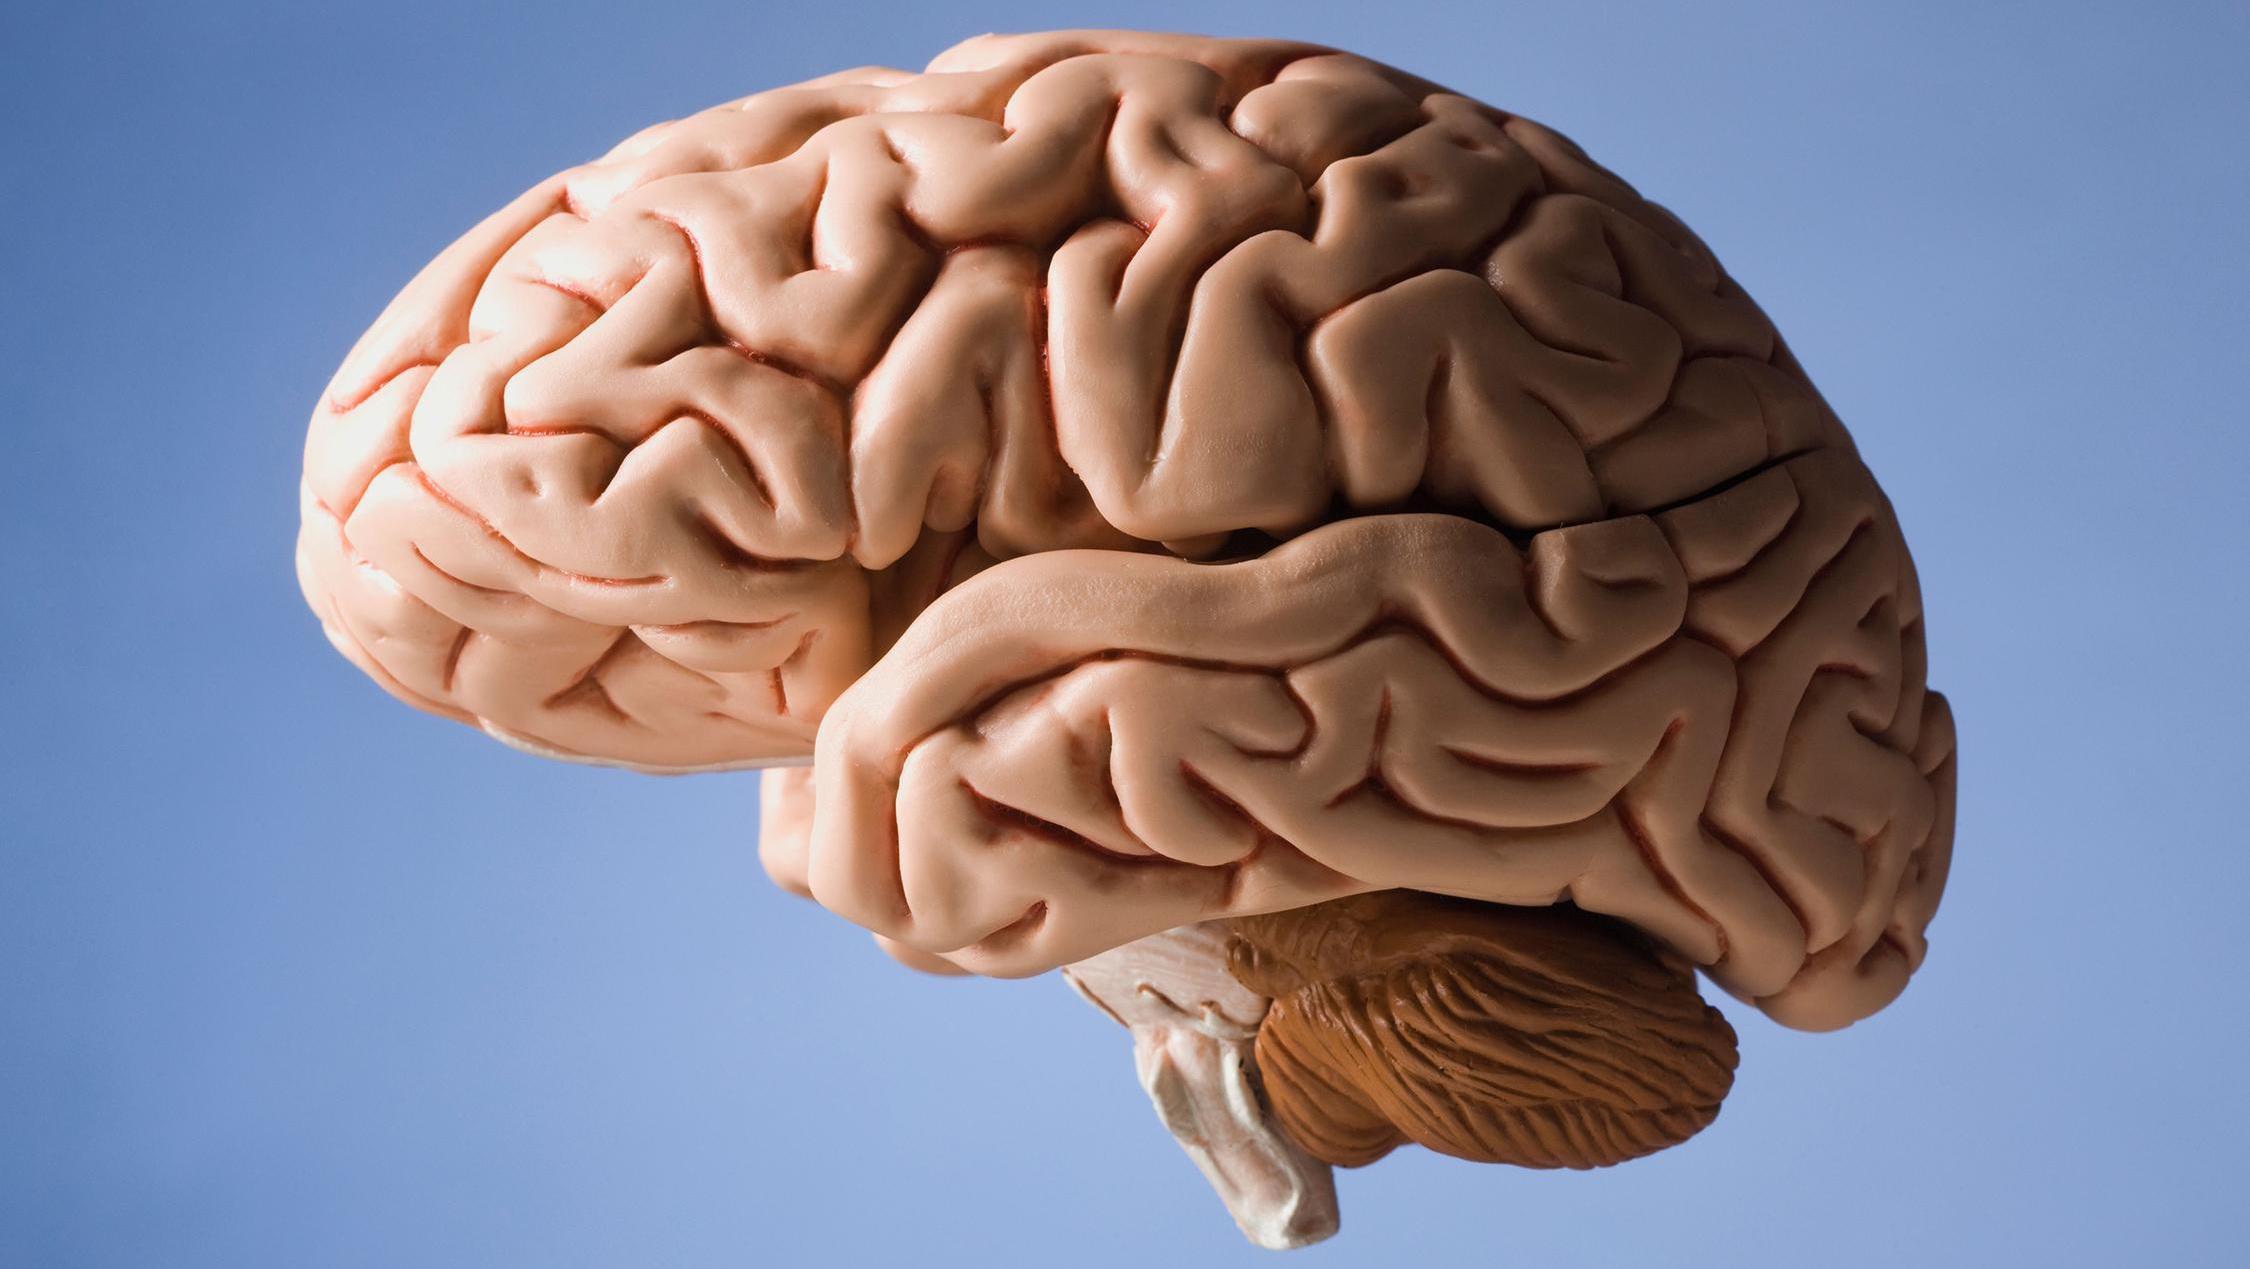 Слова из машины: преобразование нейронной активности пациента с анартрией в текст